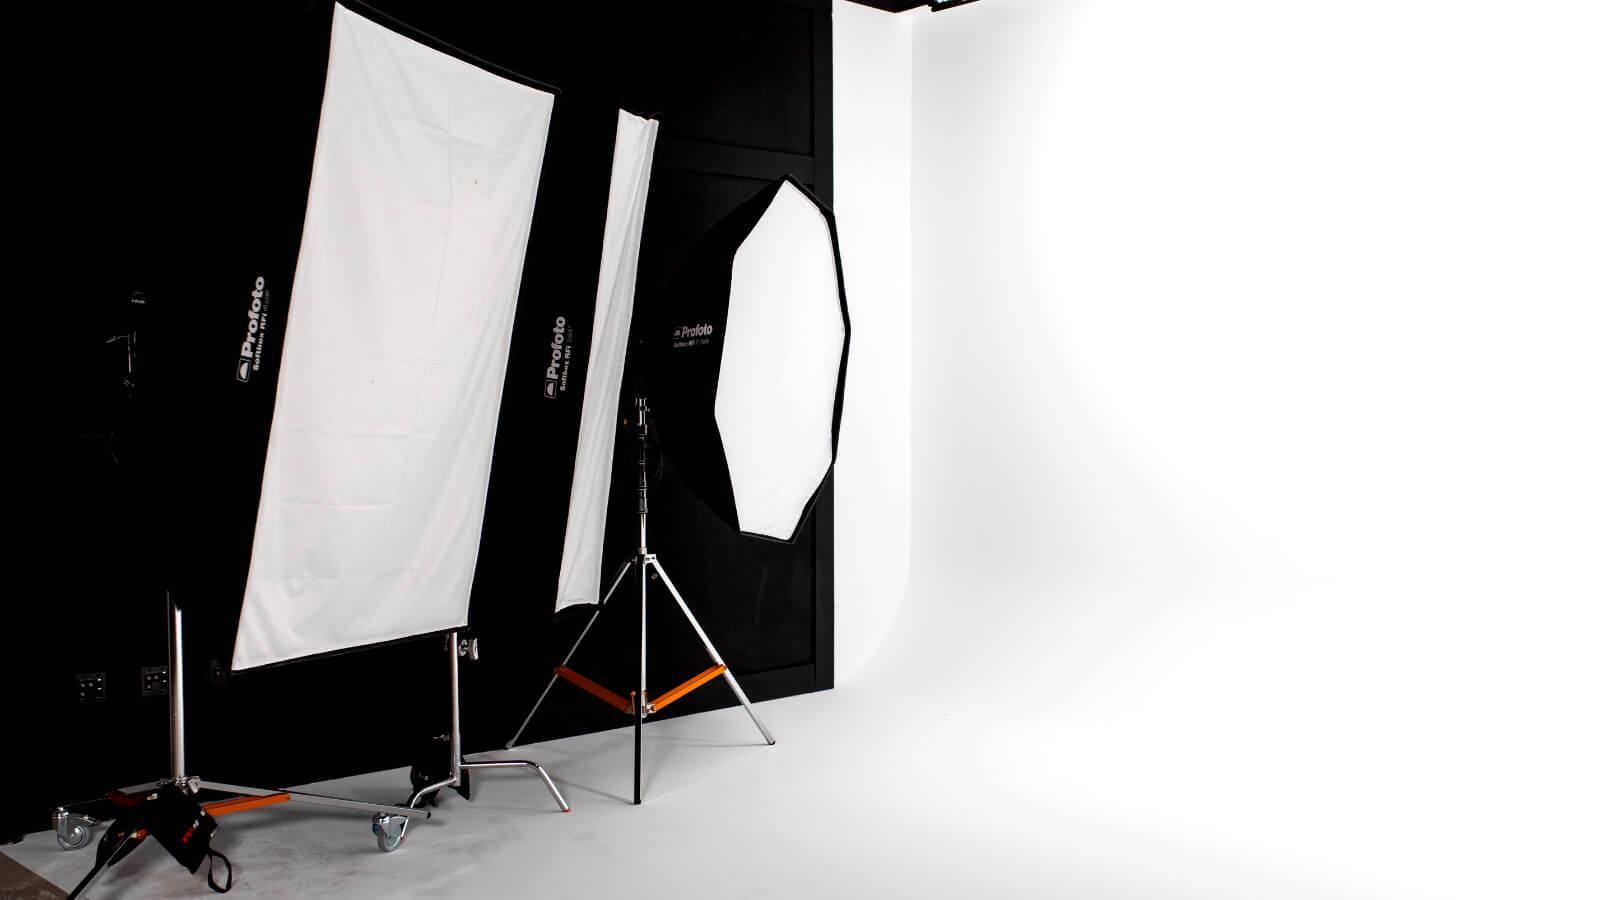 Lowtown-Studios Pro Photo Equipment